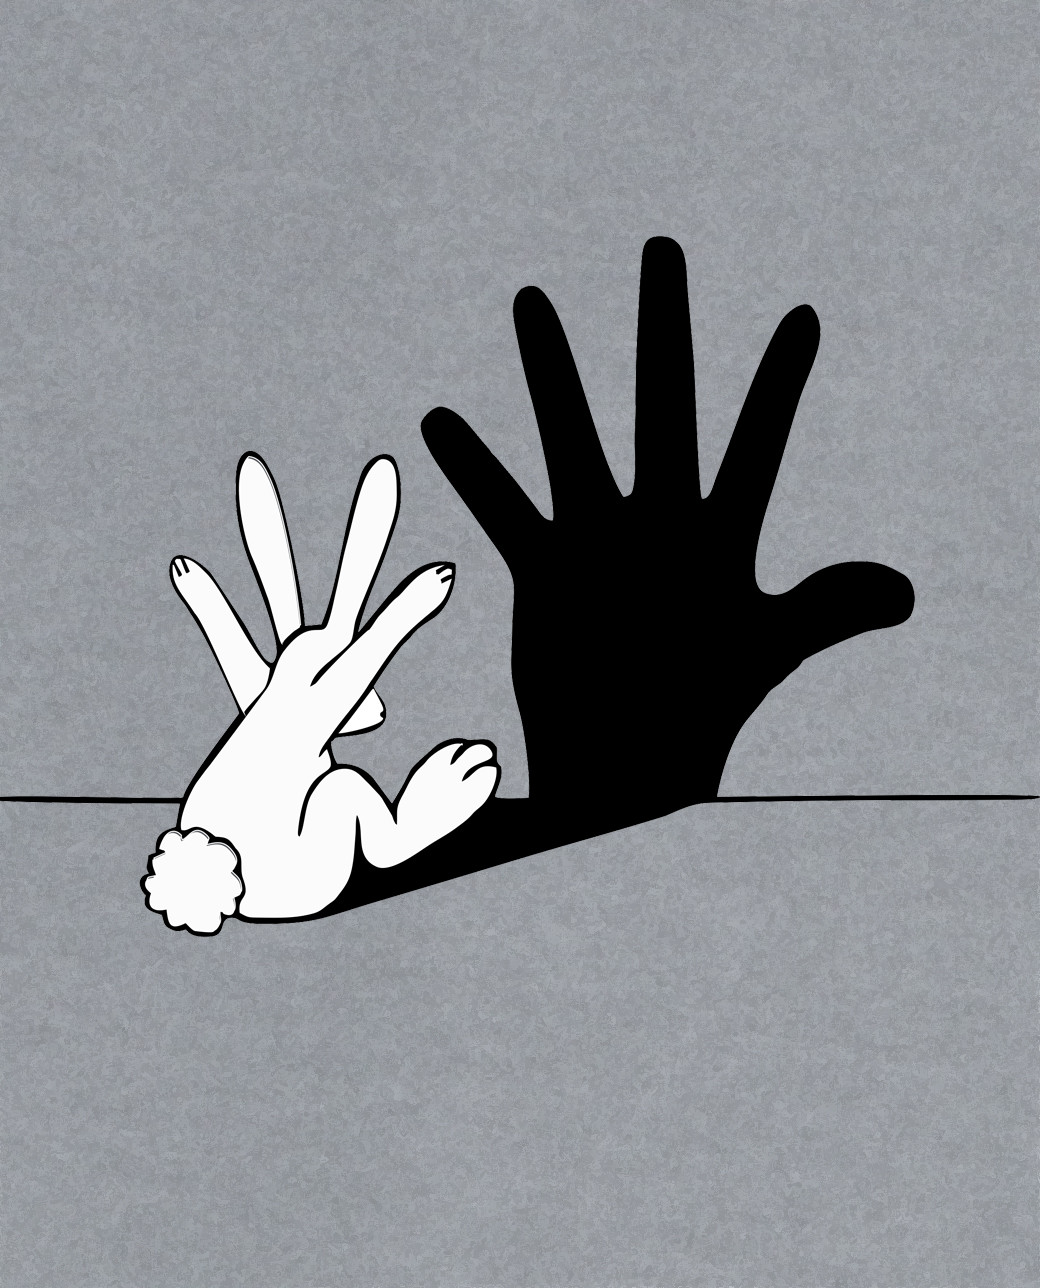 conejo sombras